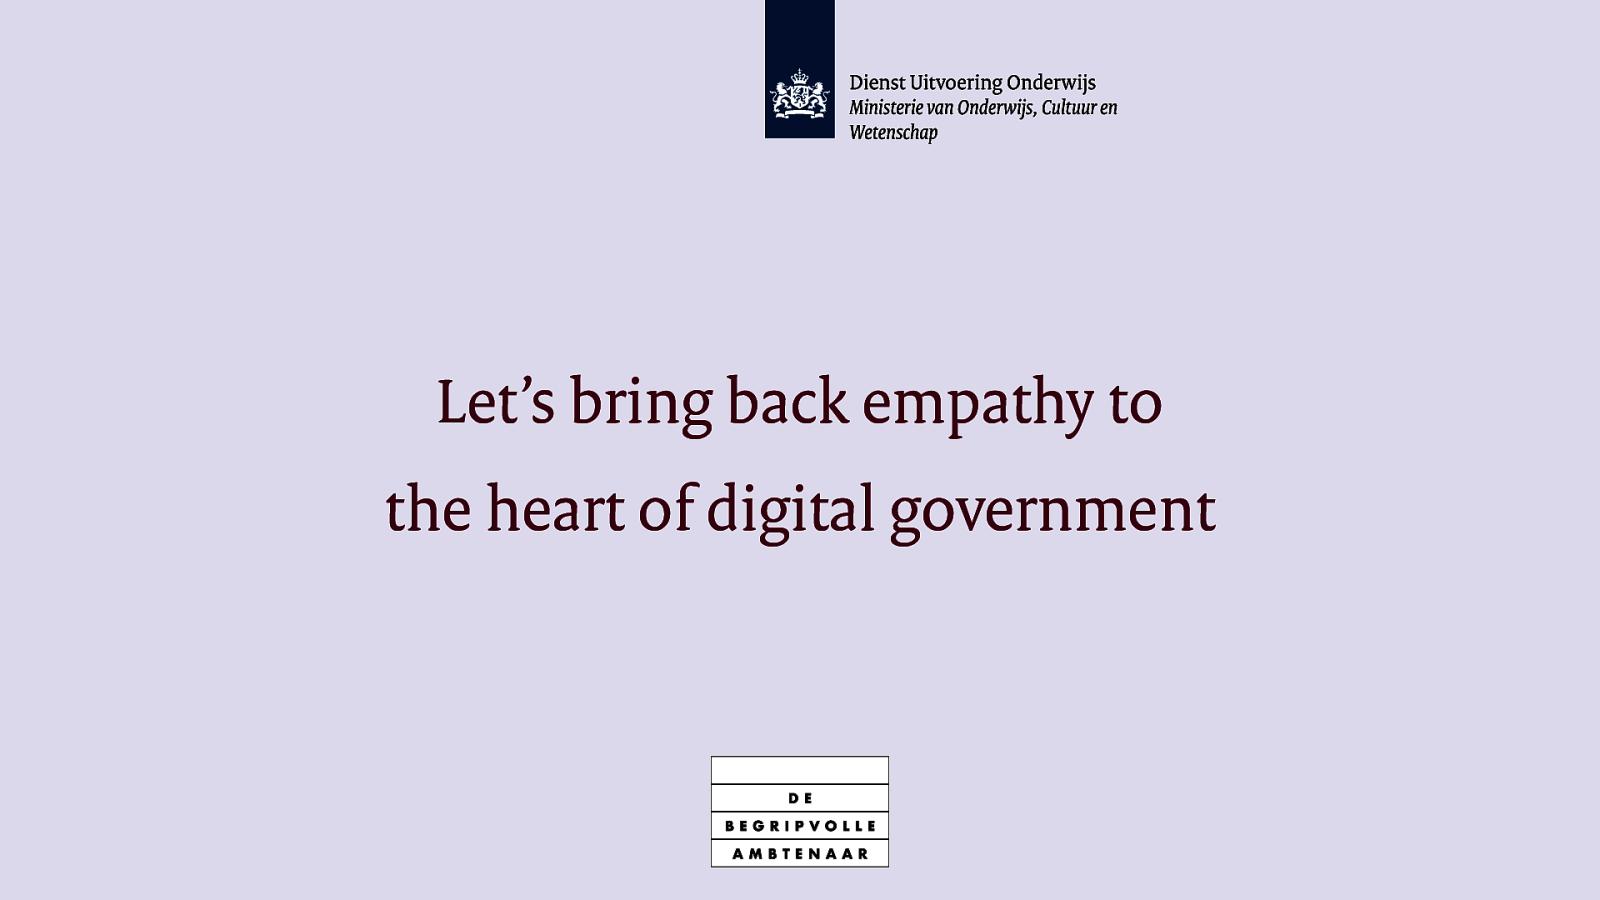 Bring back empathy